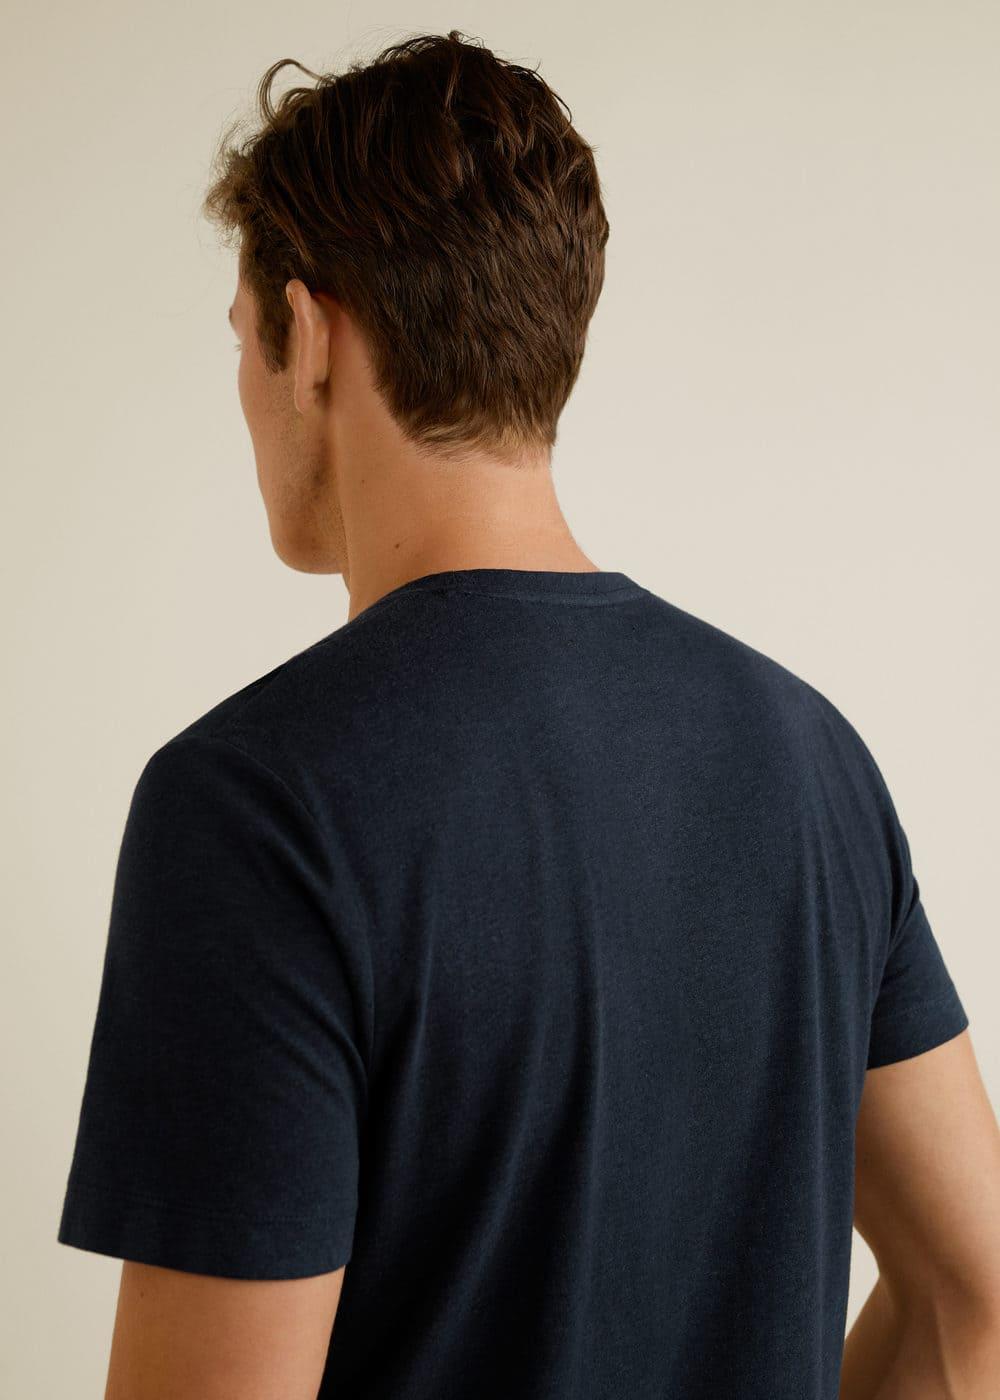 Mango - Camiseta combinada bolsillo - 3